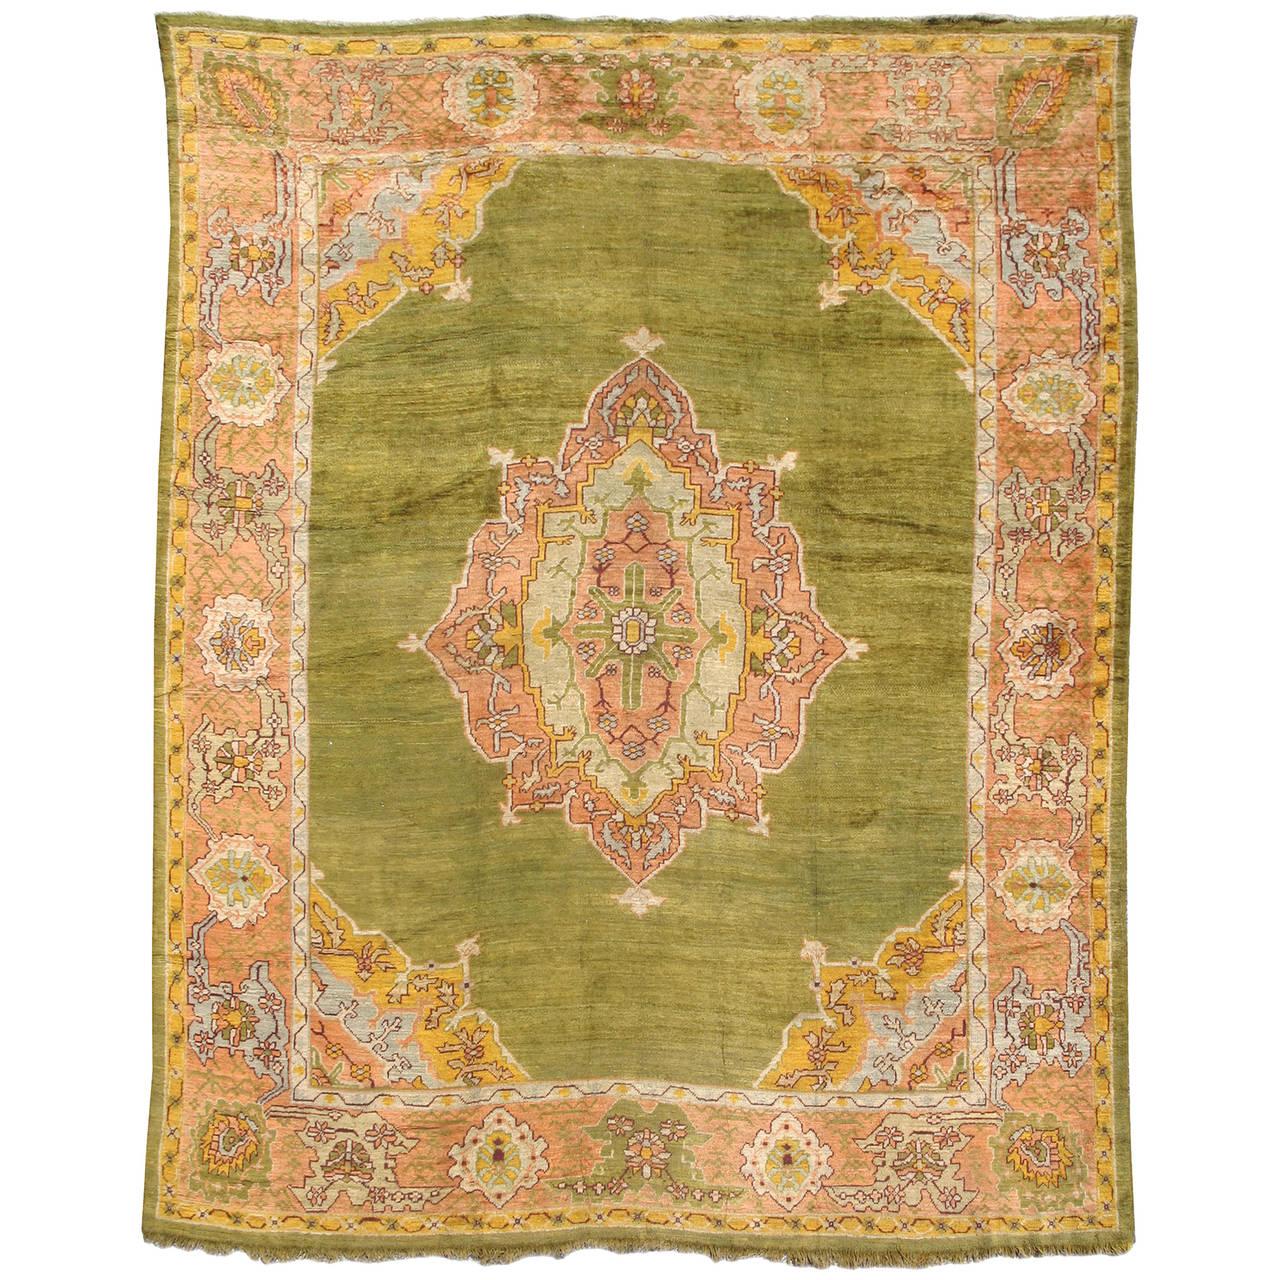 Classic Late 19th Century Oushak Carpet with Art Nouveau Flair